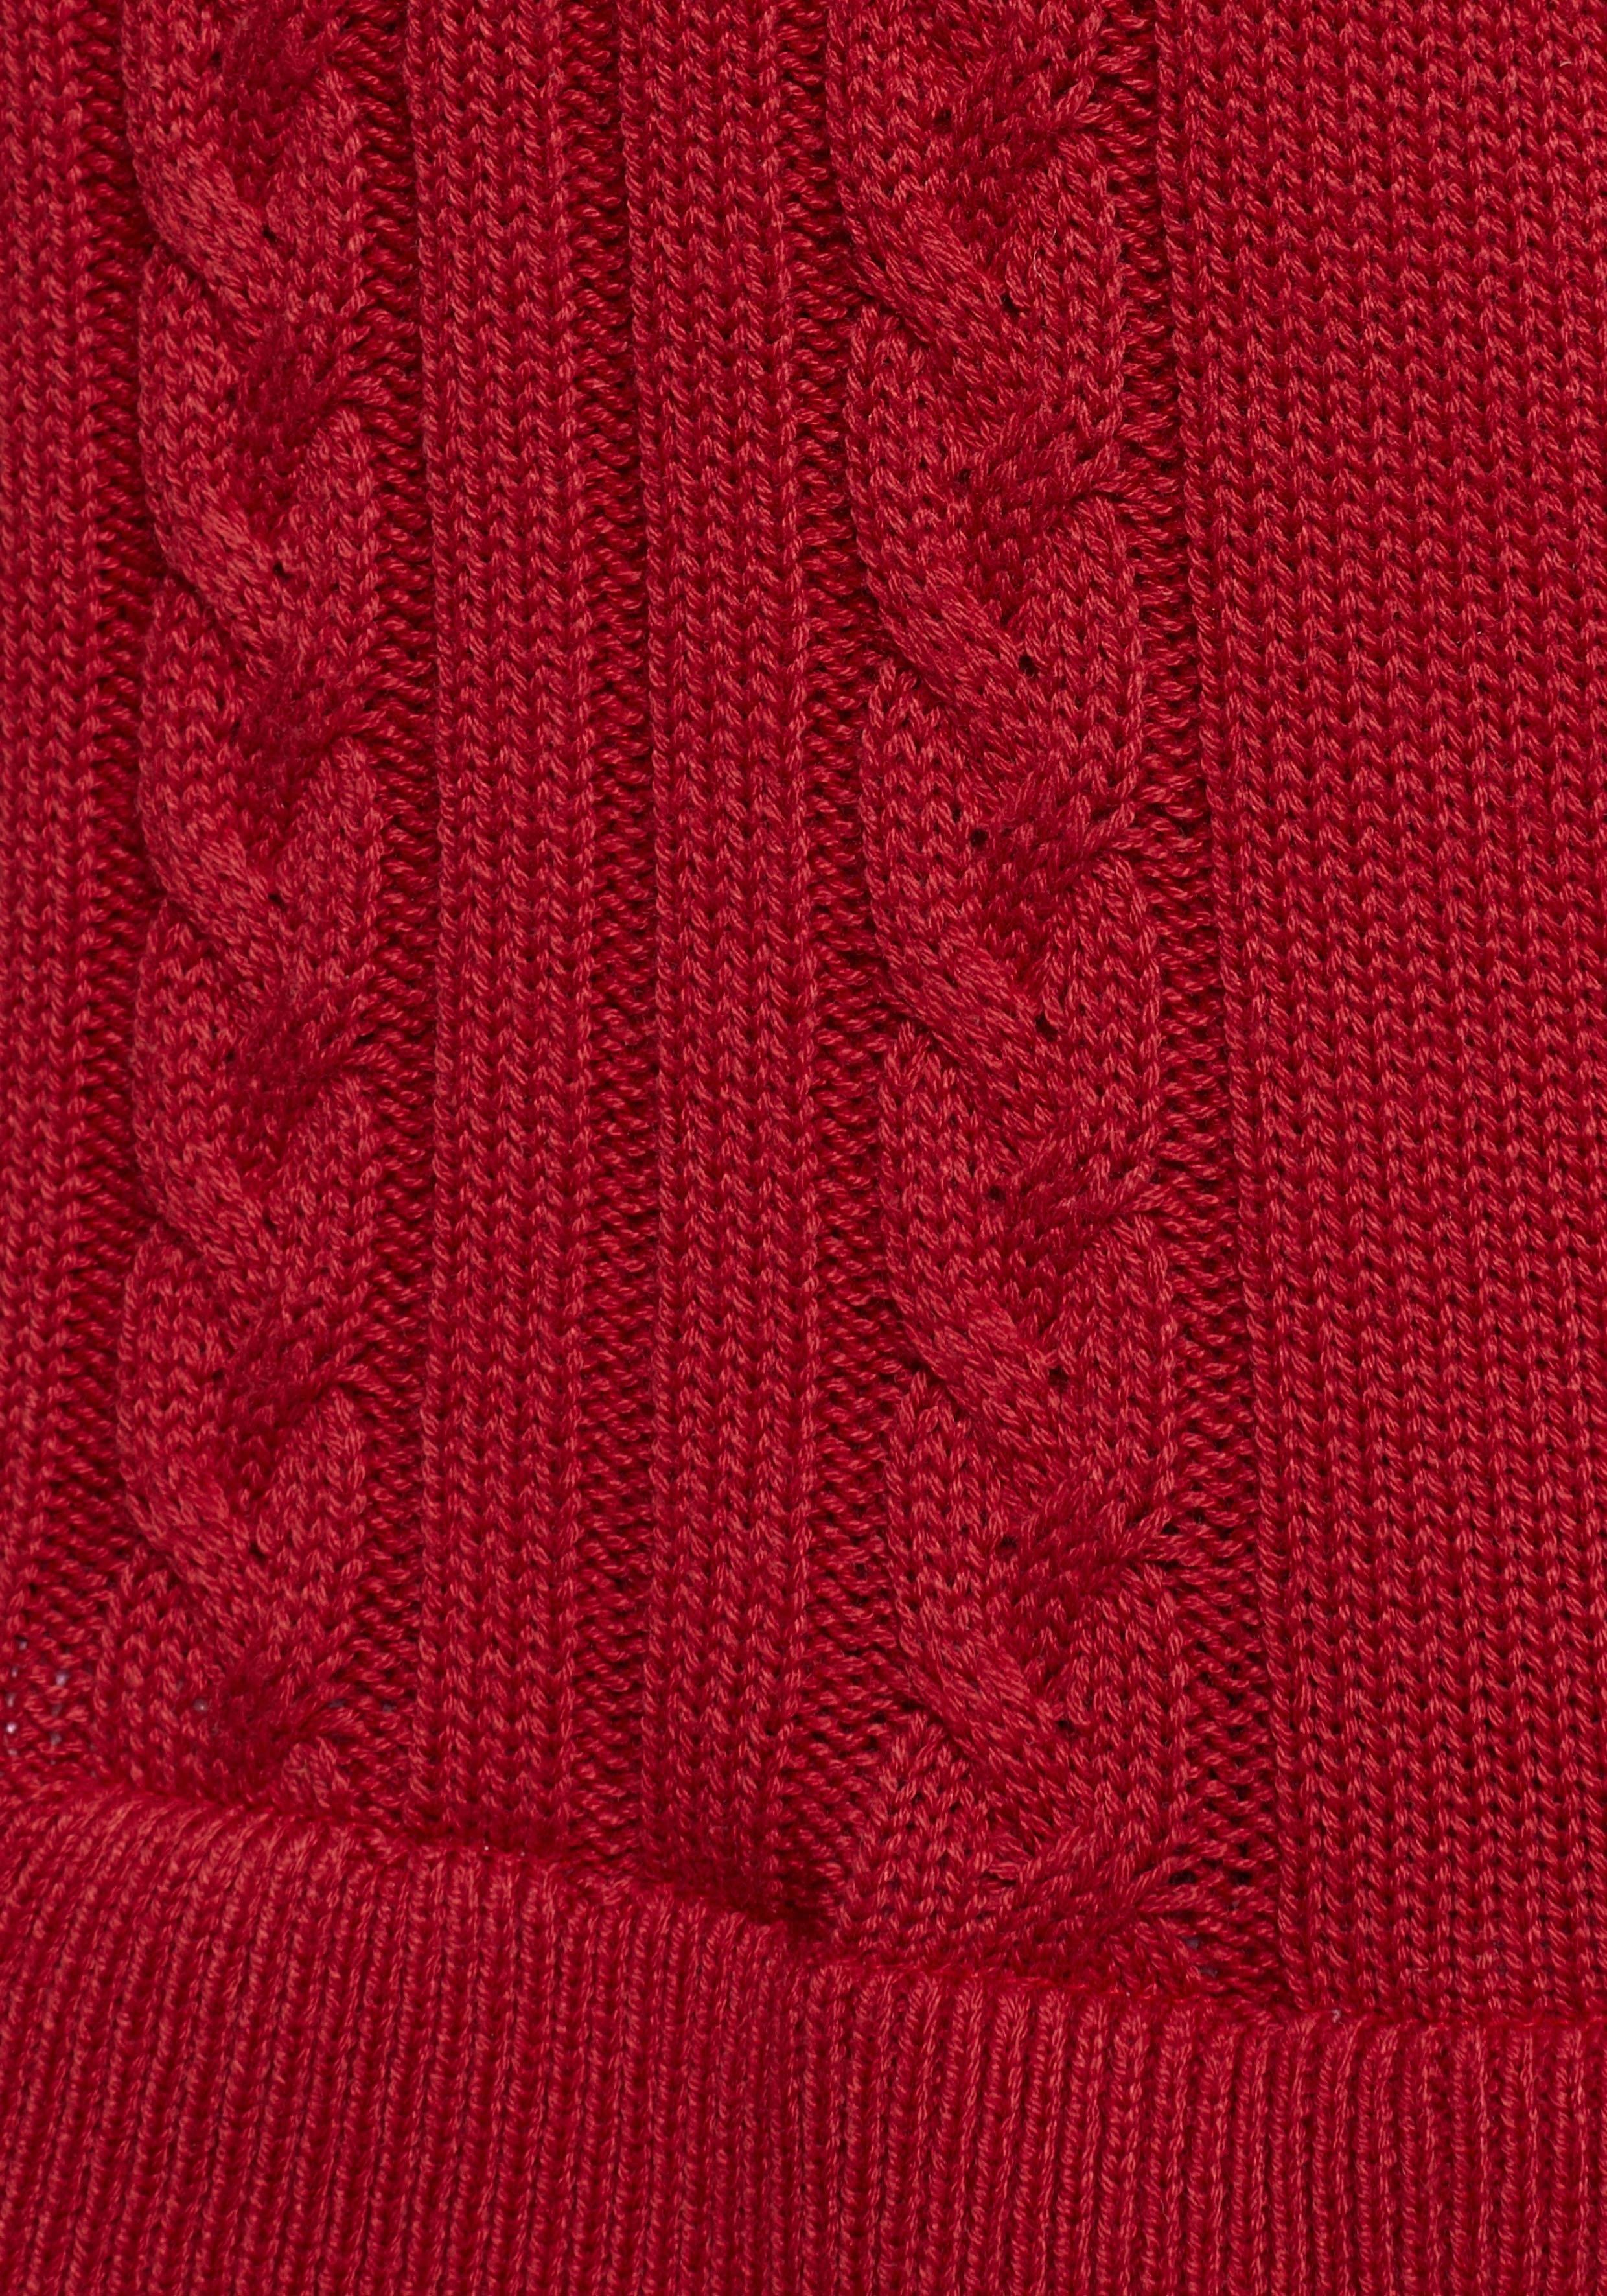 Aniston By Baur Tamaris 2-in-1-trui nu online kopen bij OTTO